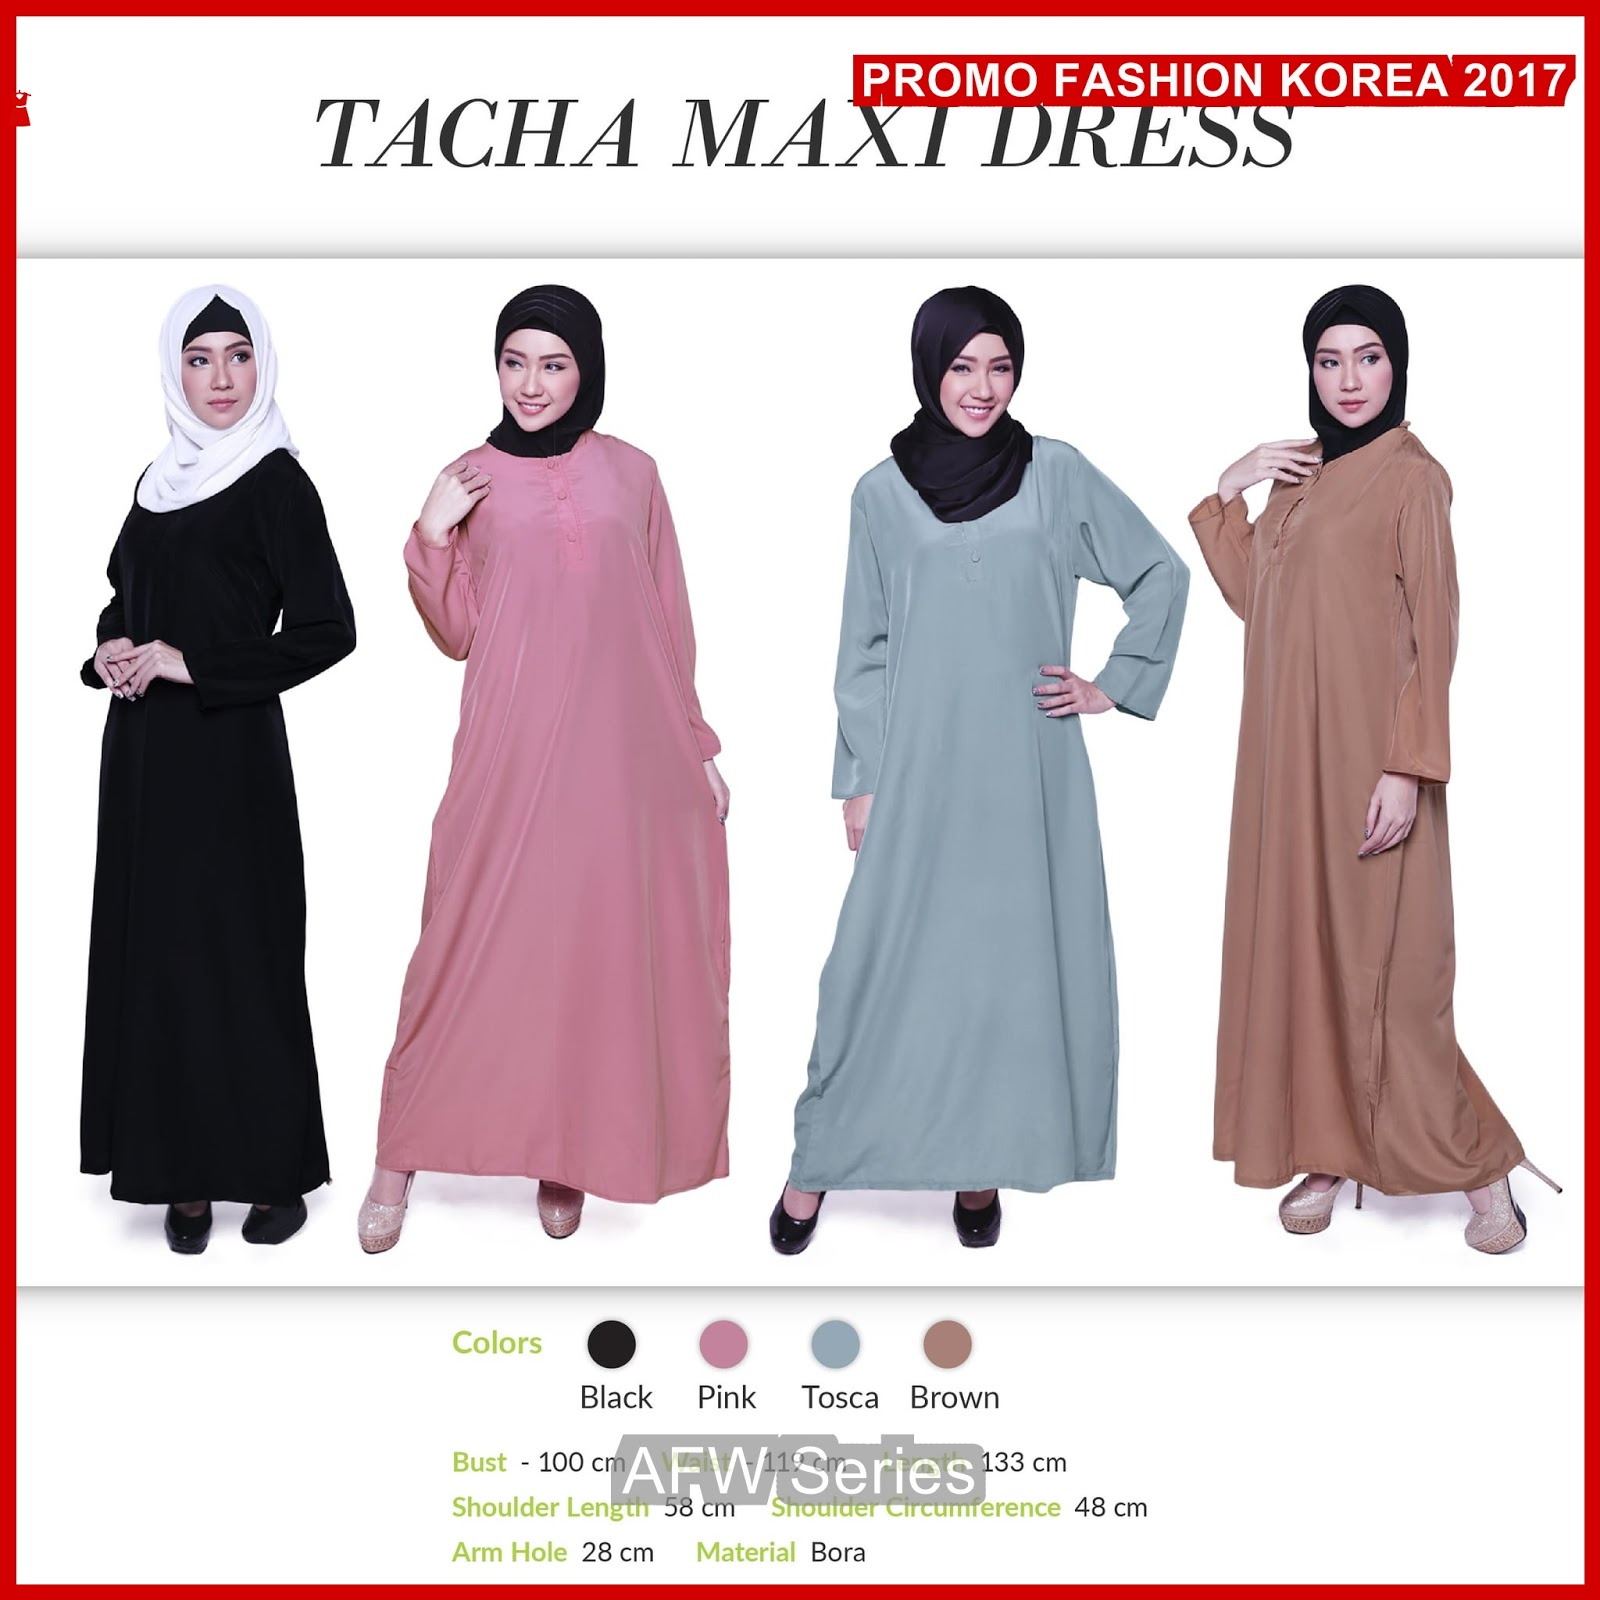 BAMFGW143 LIMITED Maxi Dress Wanita PROMO BMG